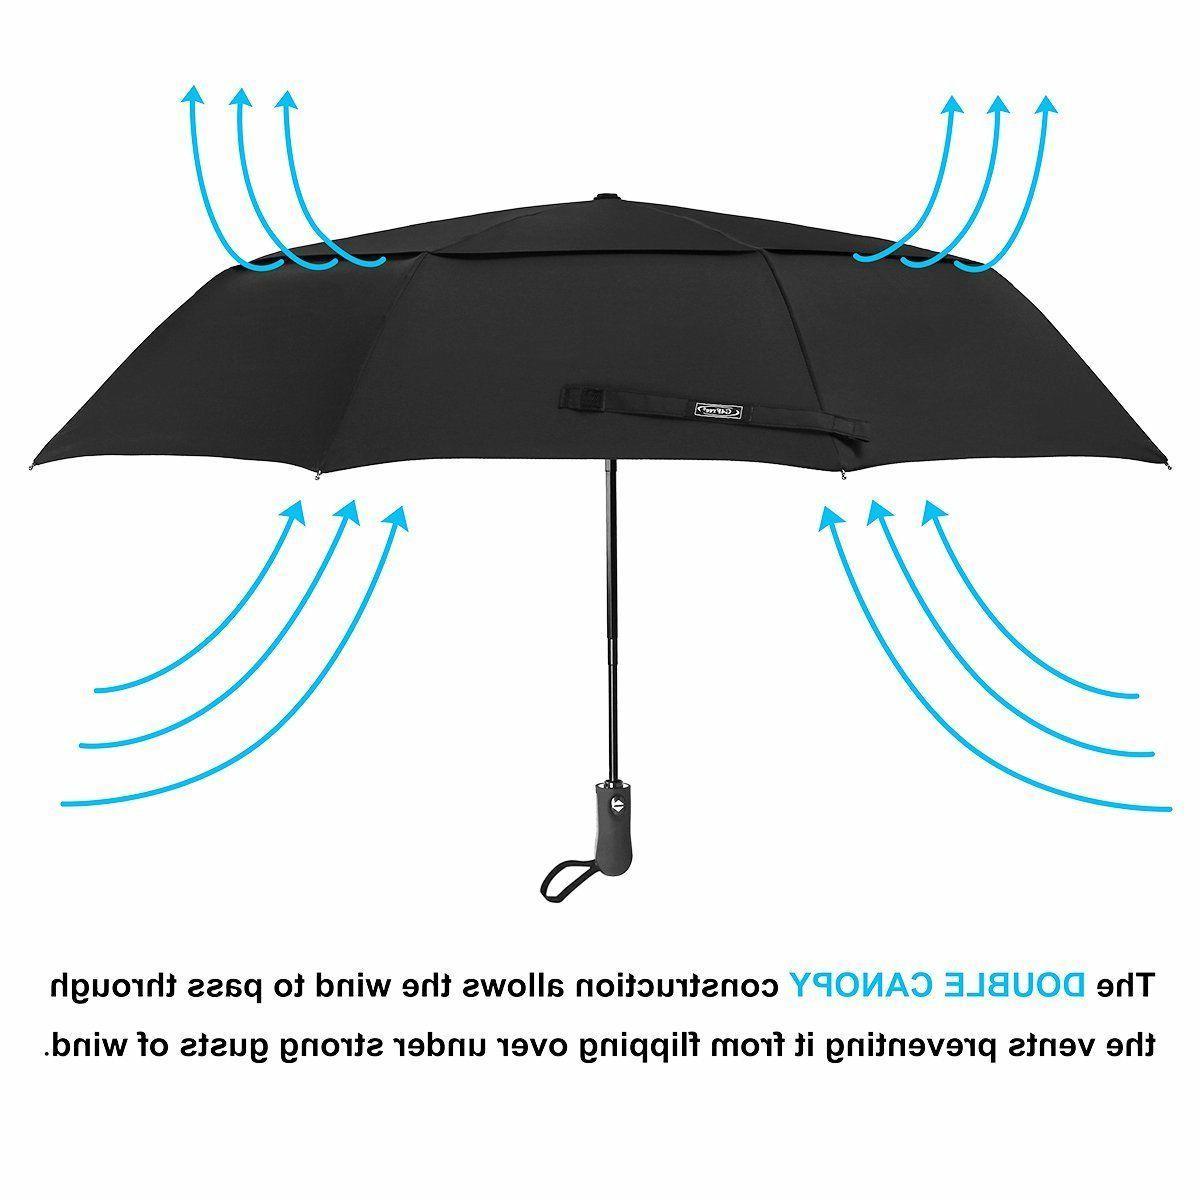 NEW In CompactFoldingGolfUmbrellaTravel Umbrella- Men/Women